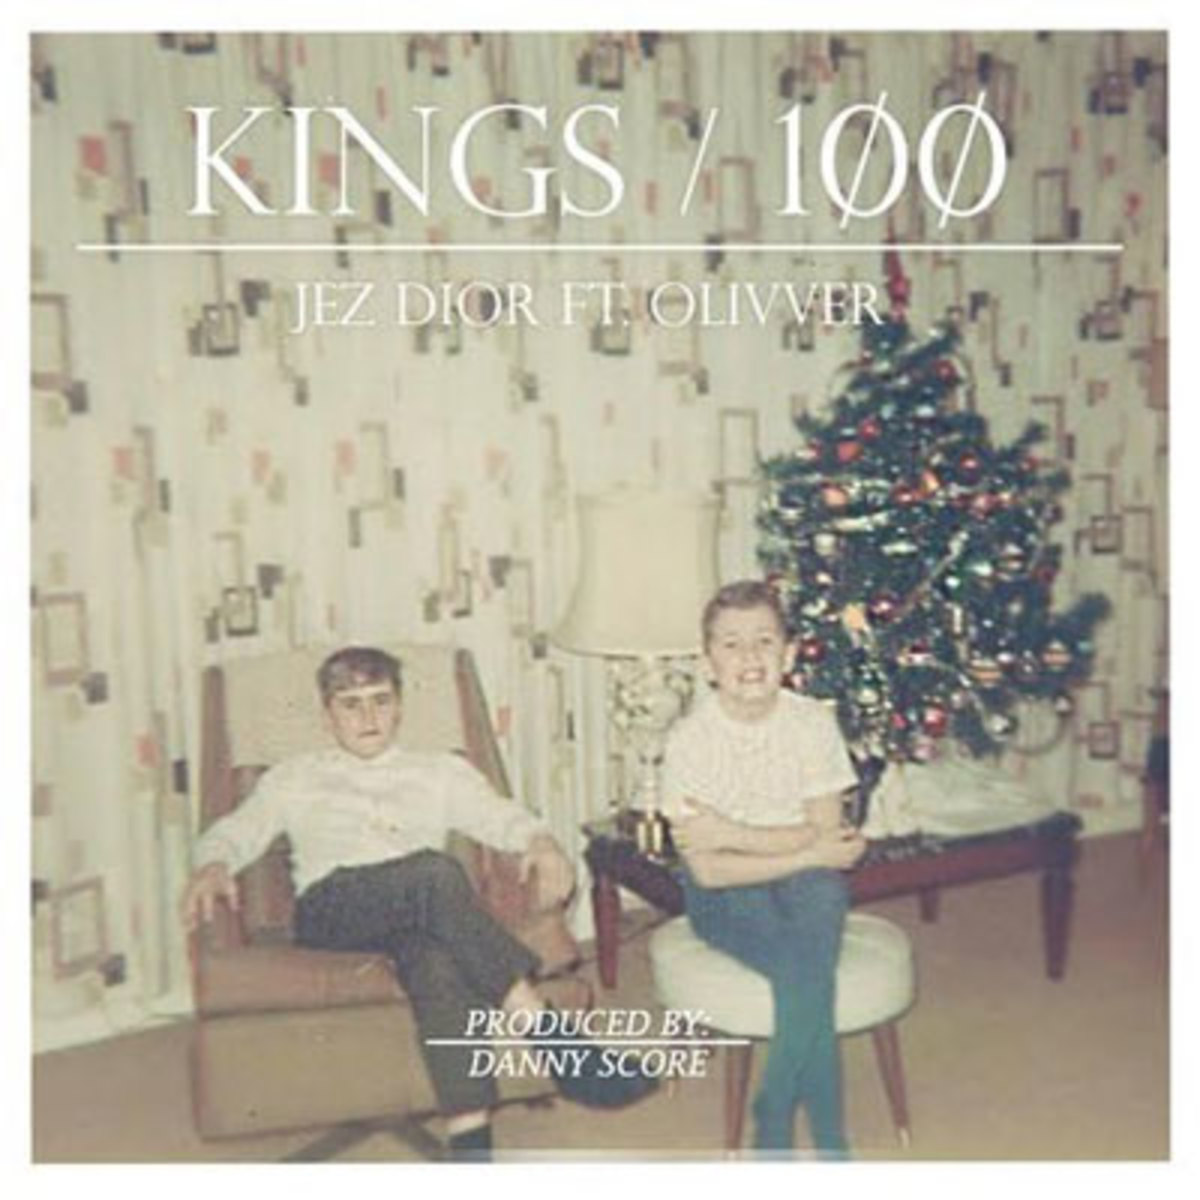 jezdior-kings100.jpg